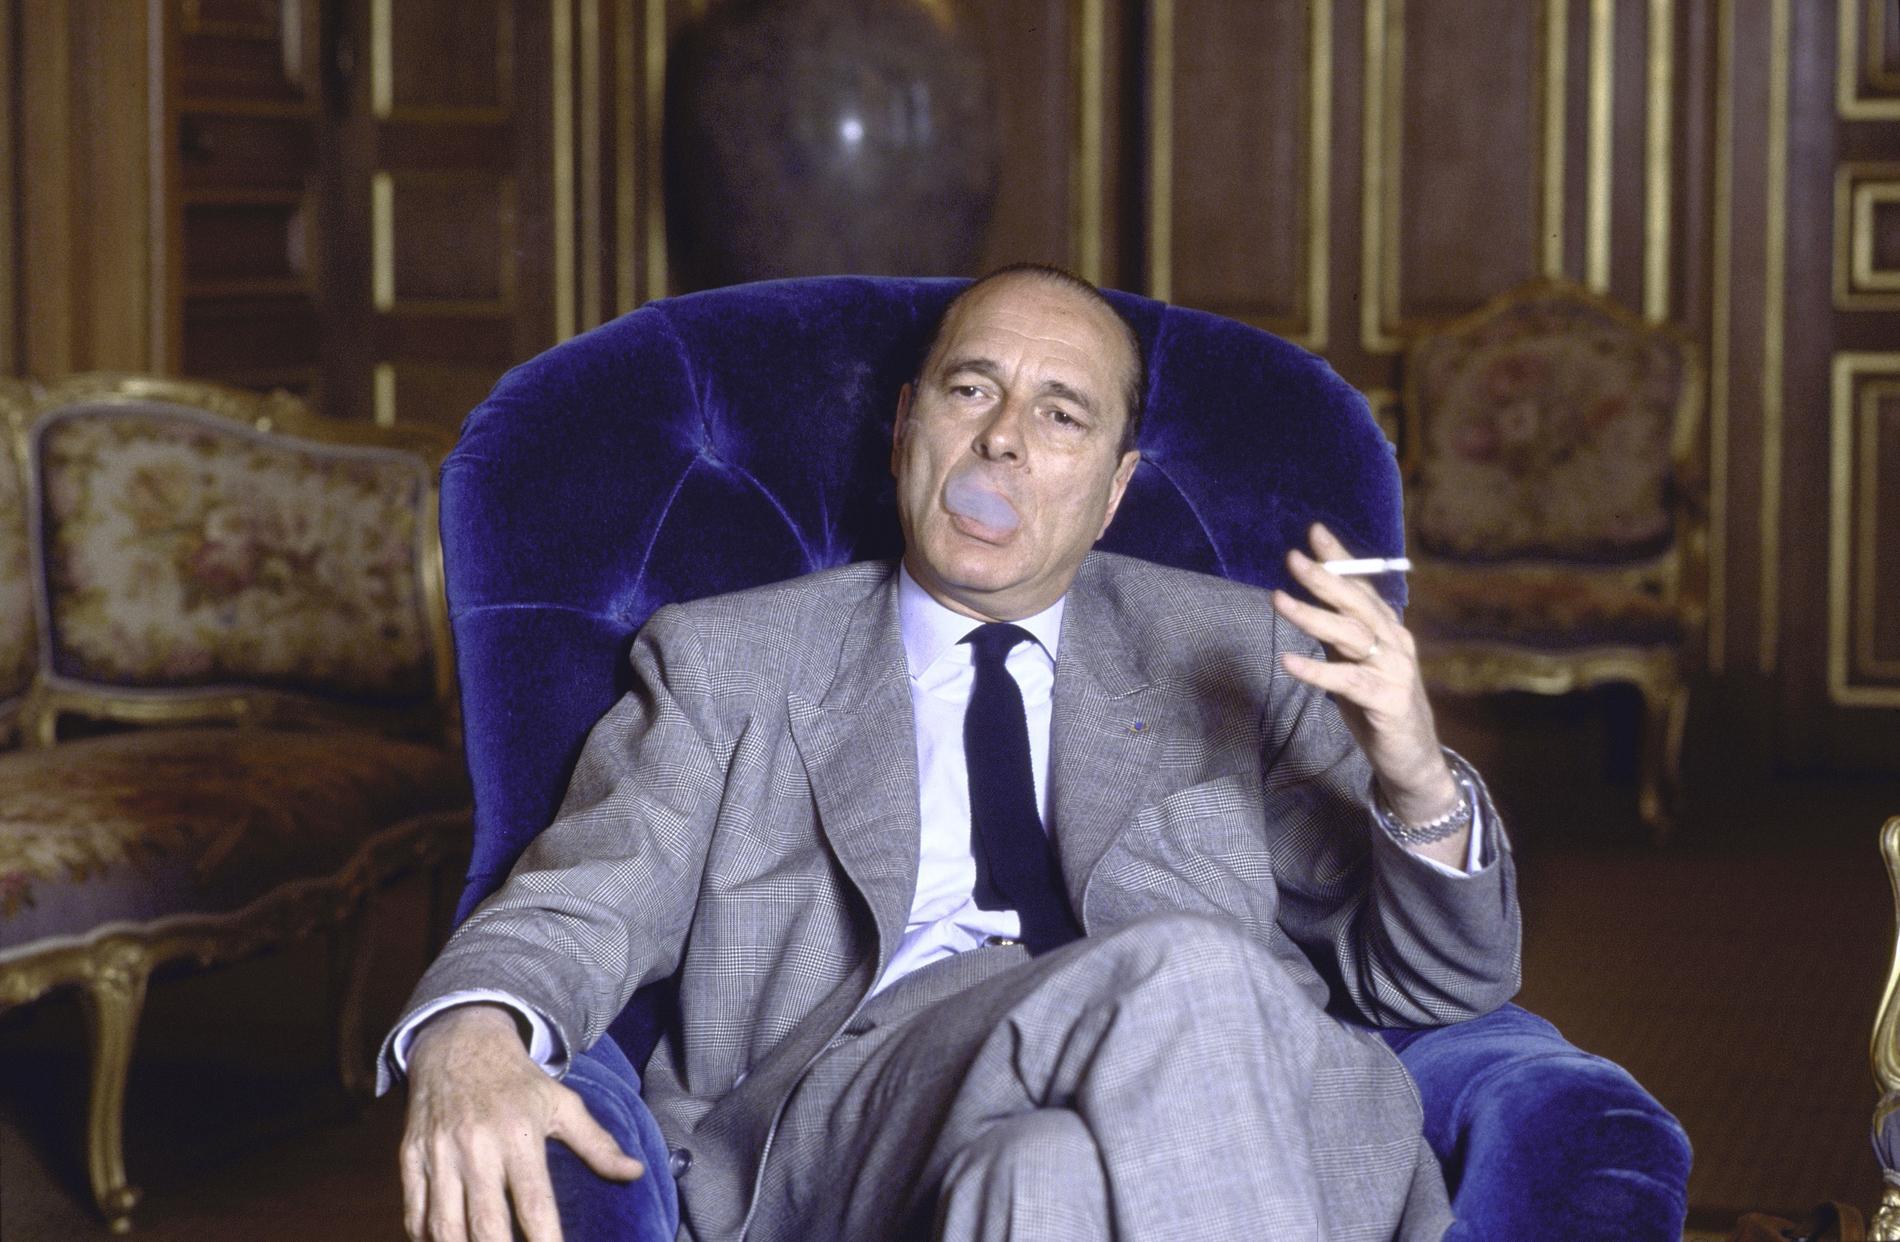 https://i.f1g.fr/media/madame/1900x1425/sites/default/files/img/2019/09/jacques-chirac-president-de-la-hype-photo-27.jpg